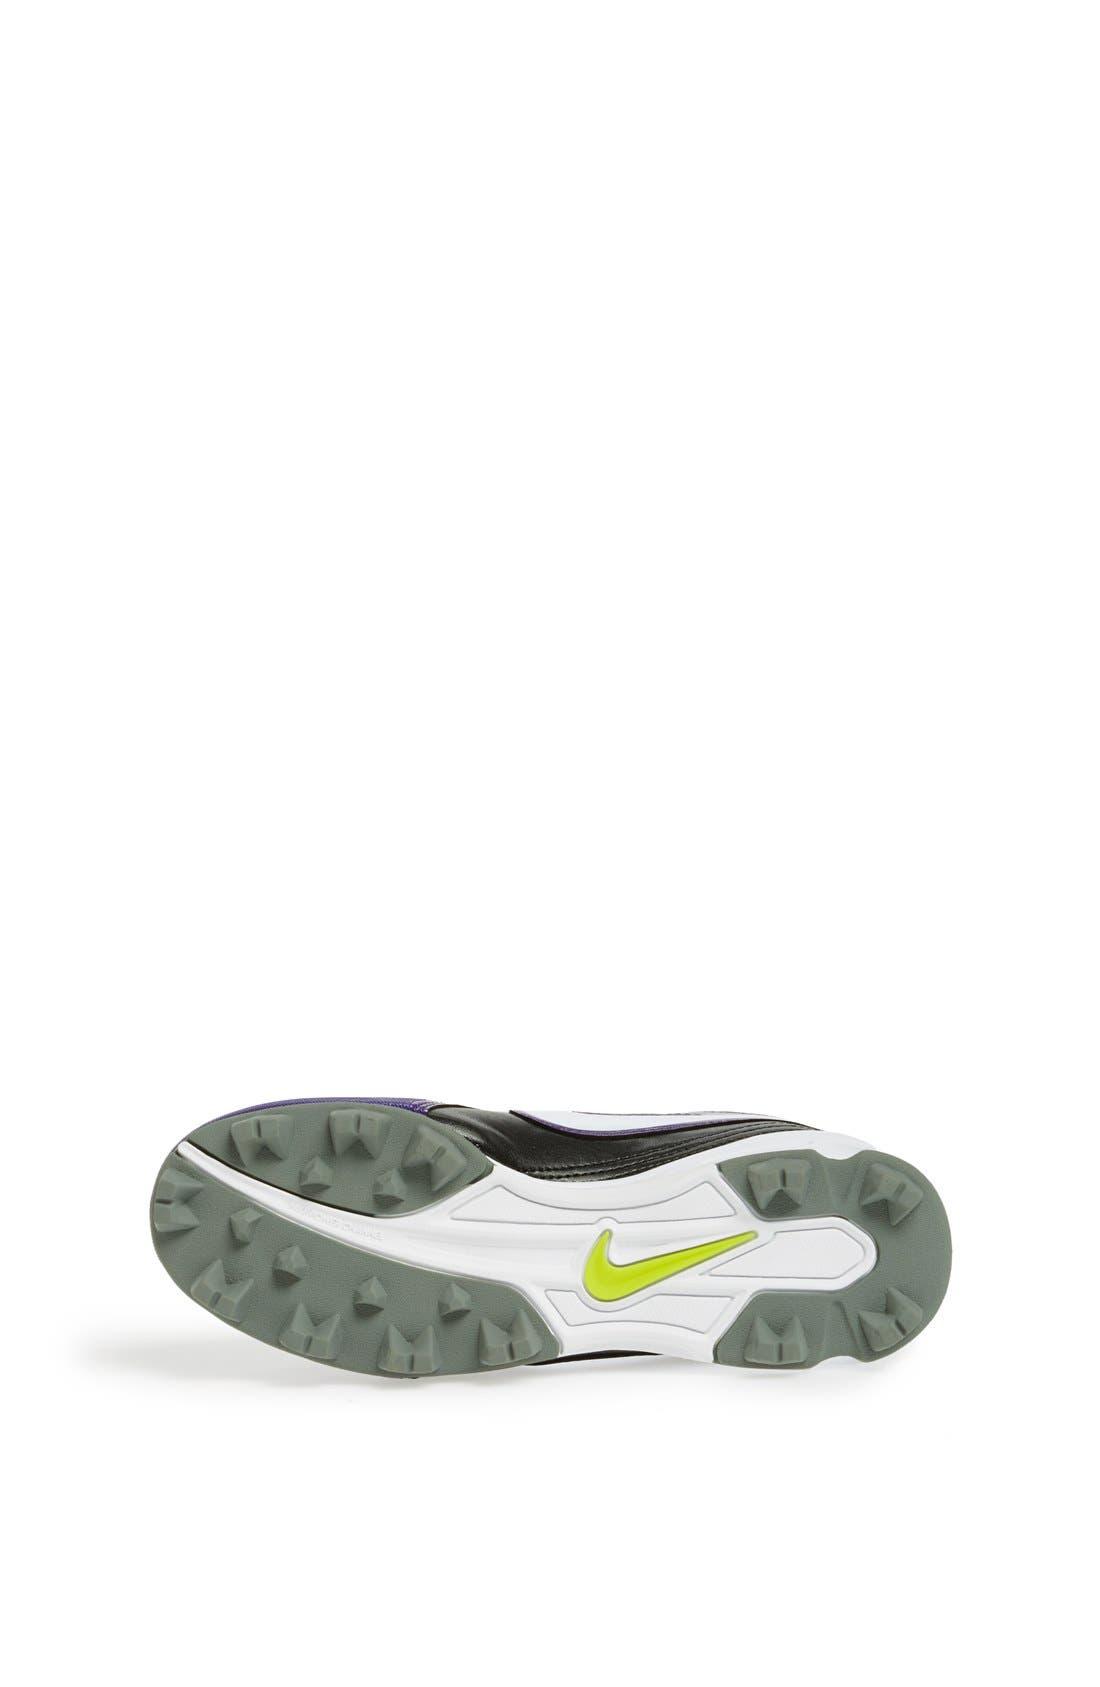 Alternate Image 4  - Nike 'Unify Keystone' Softball Cleat (Toddler, Little Kid & Big Kid)